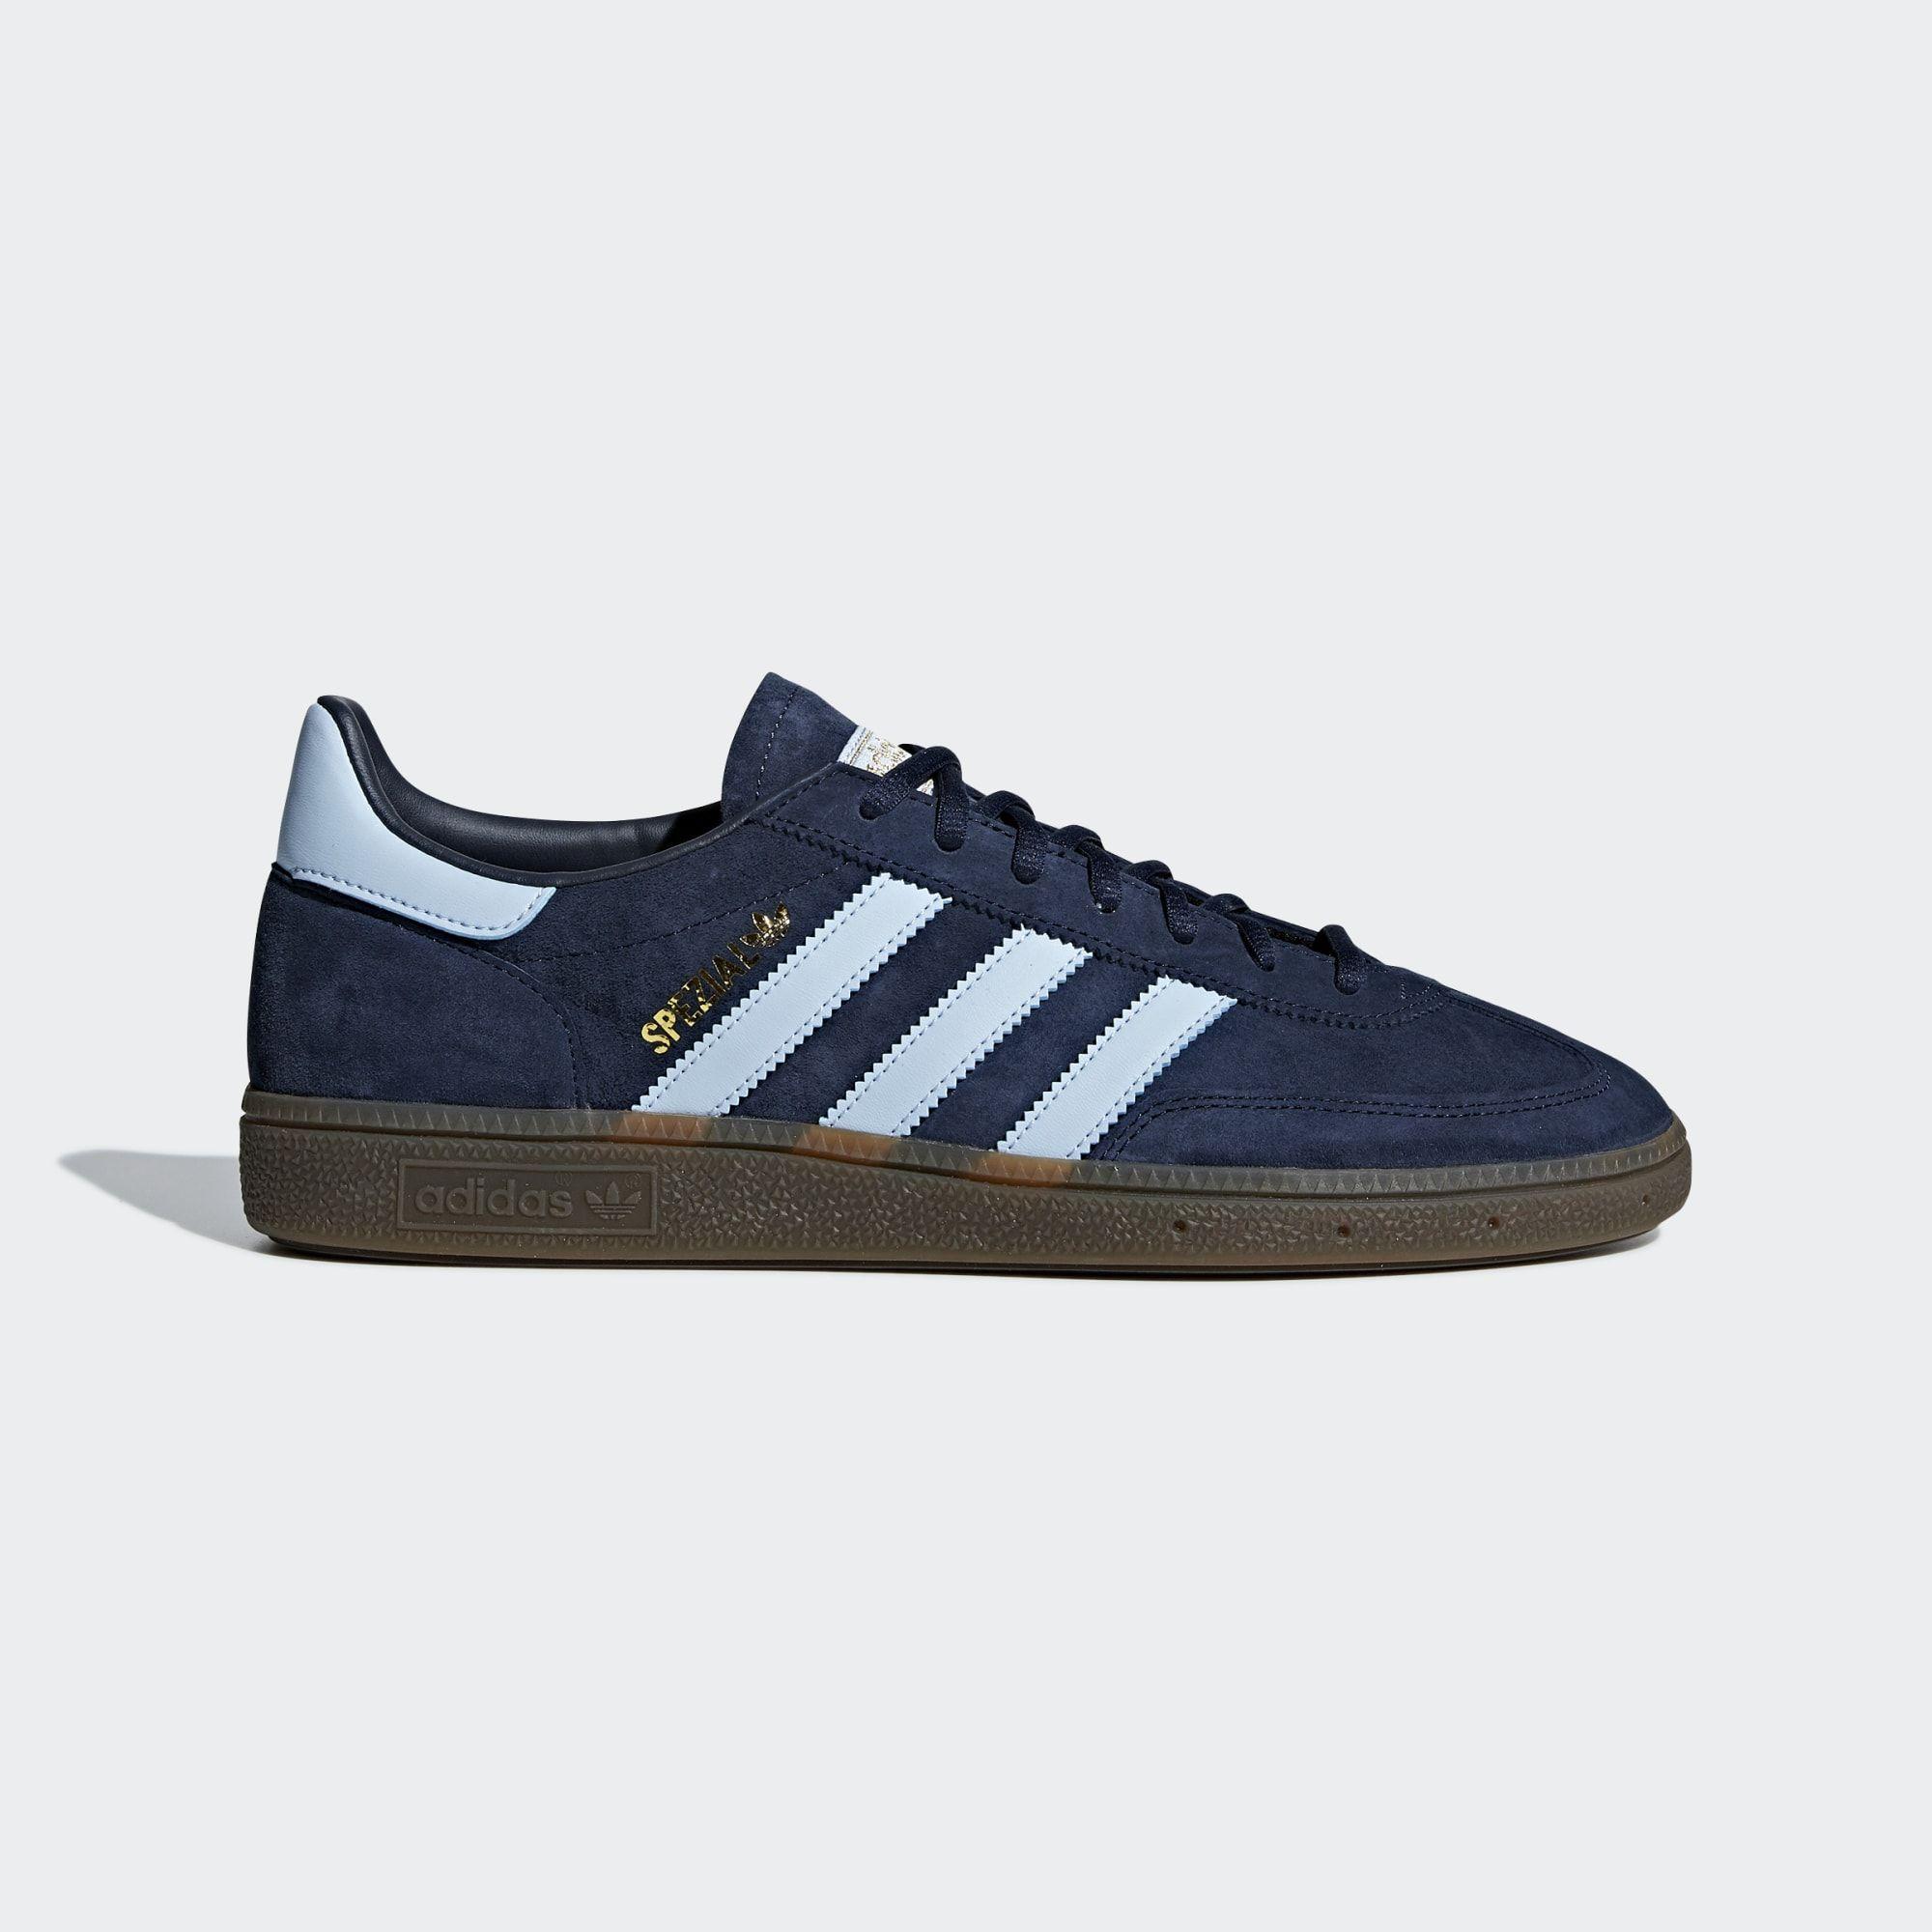 adidas Handball Spezial Shoes Blue | adidas US Shoes